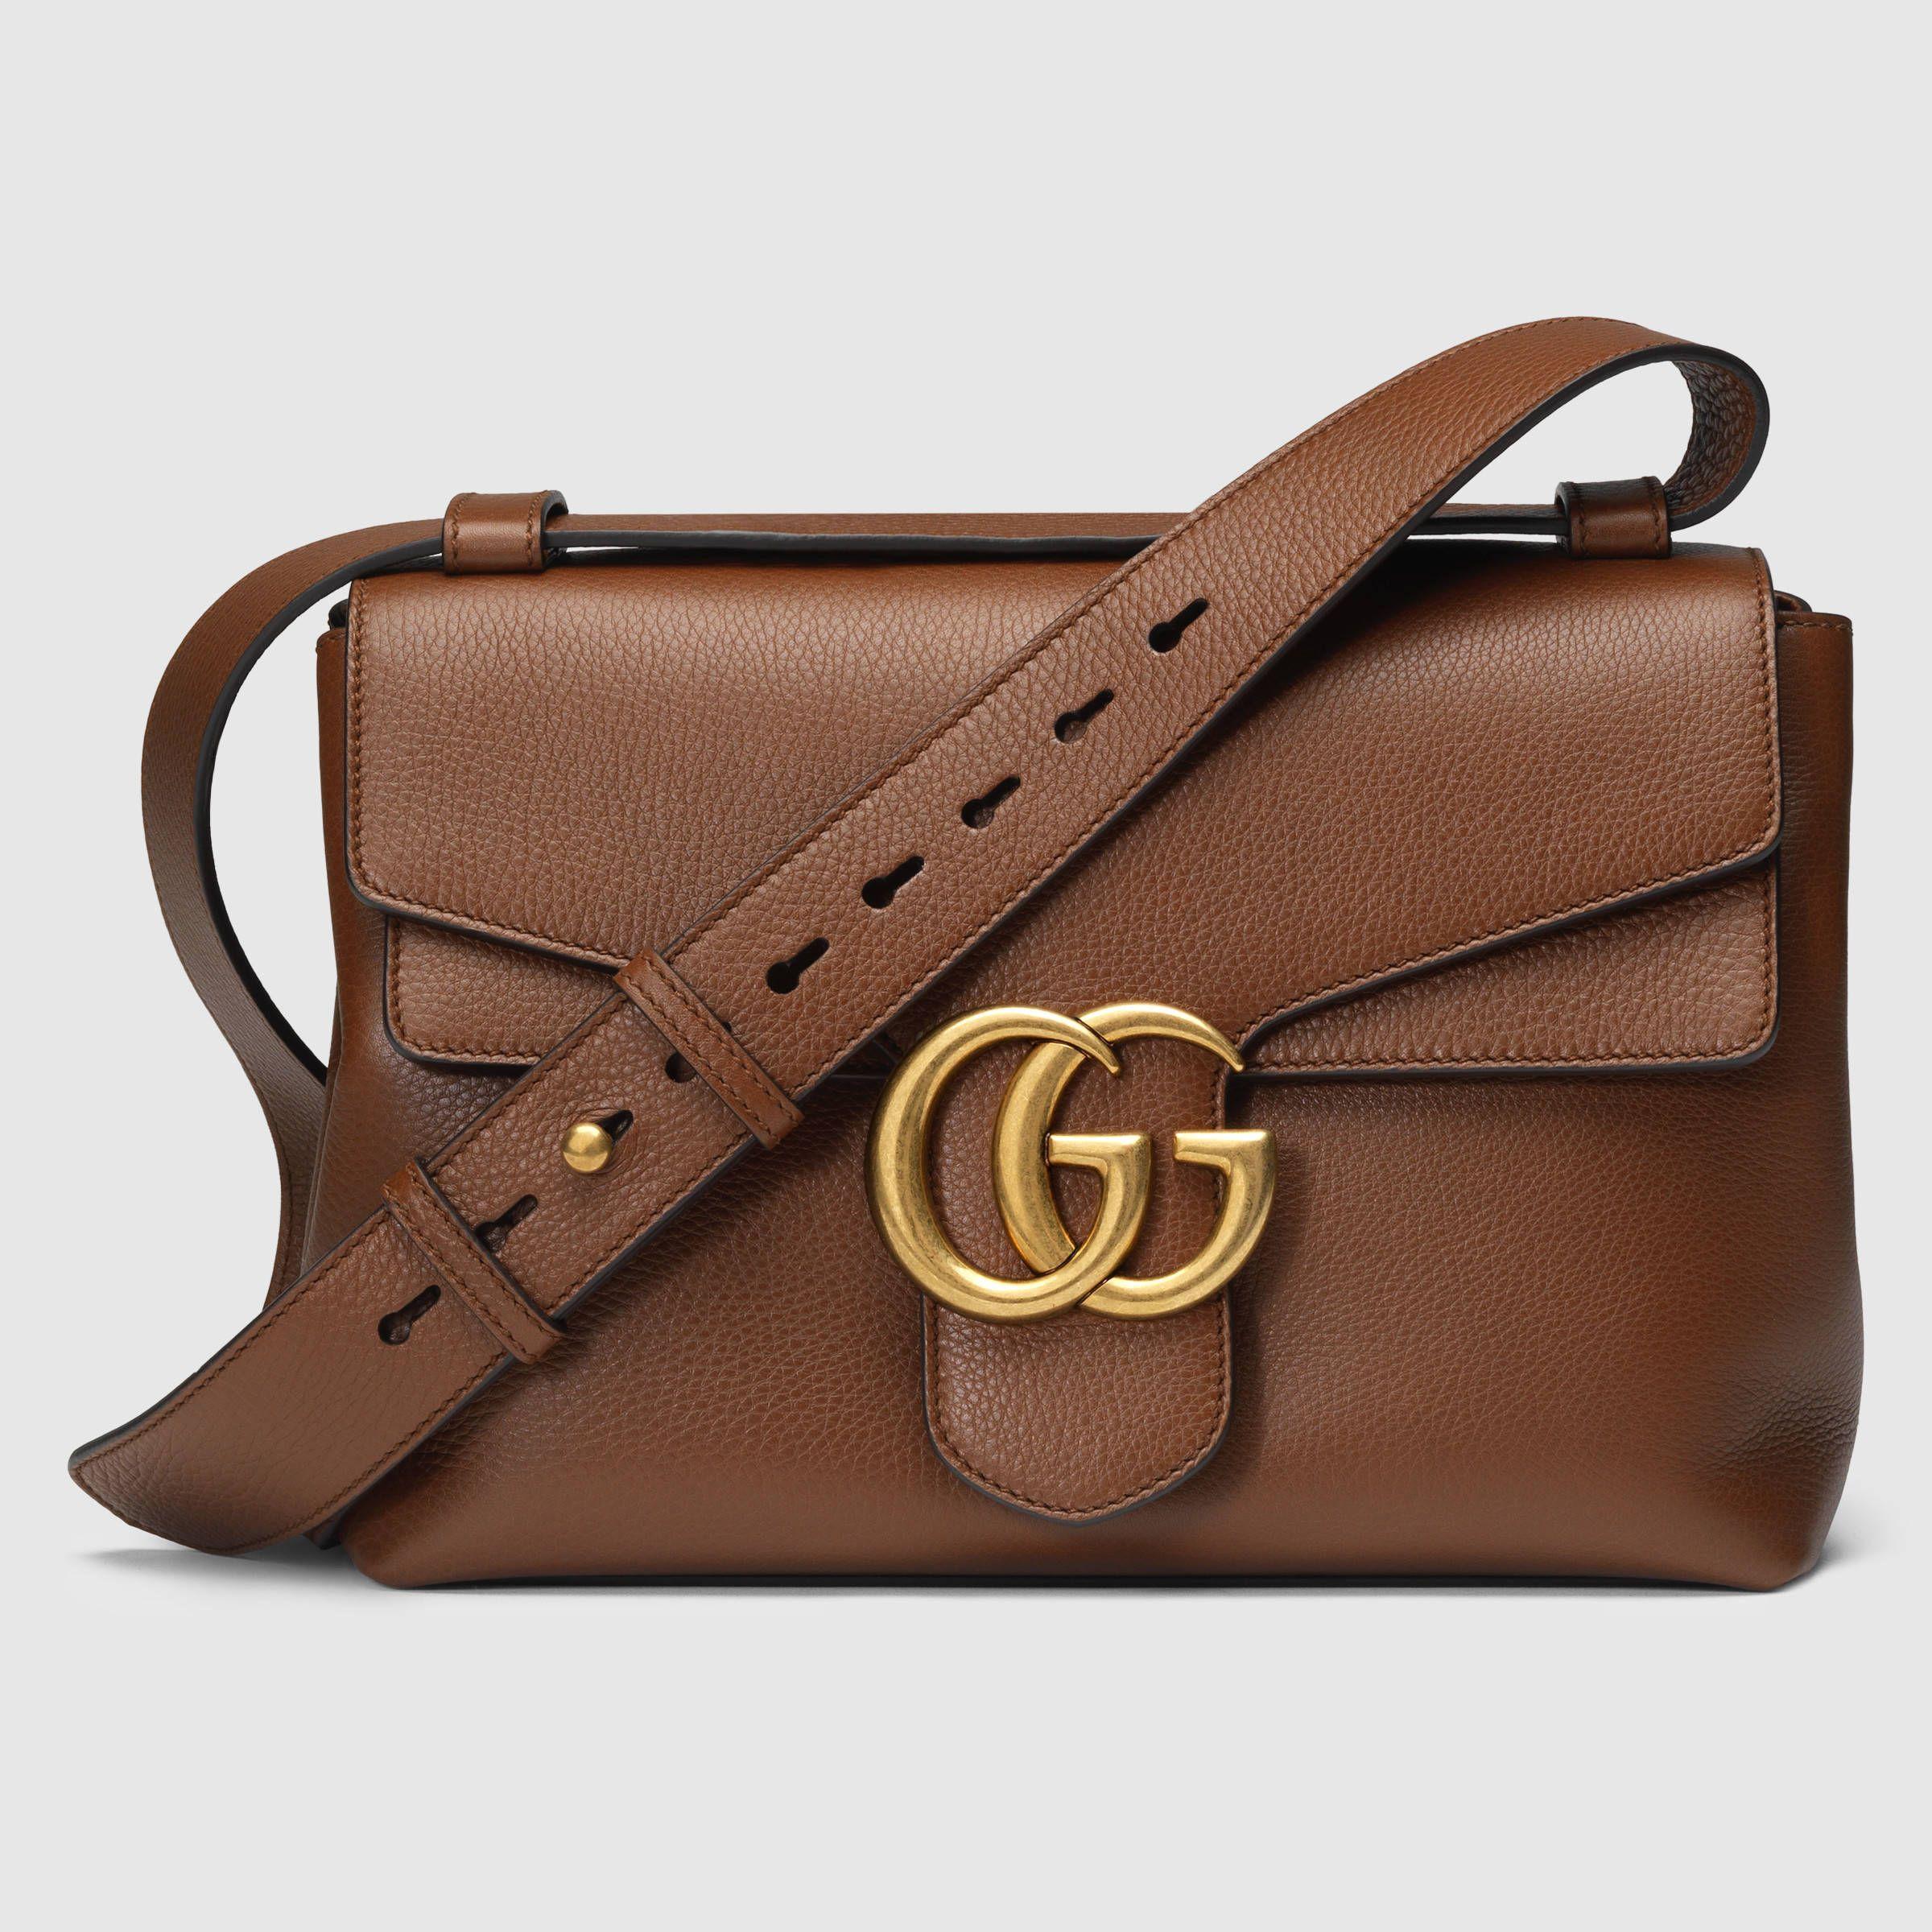 Gucci Women - GG Marmont leather shoulder bag - 401173A7M0T2548